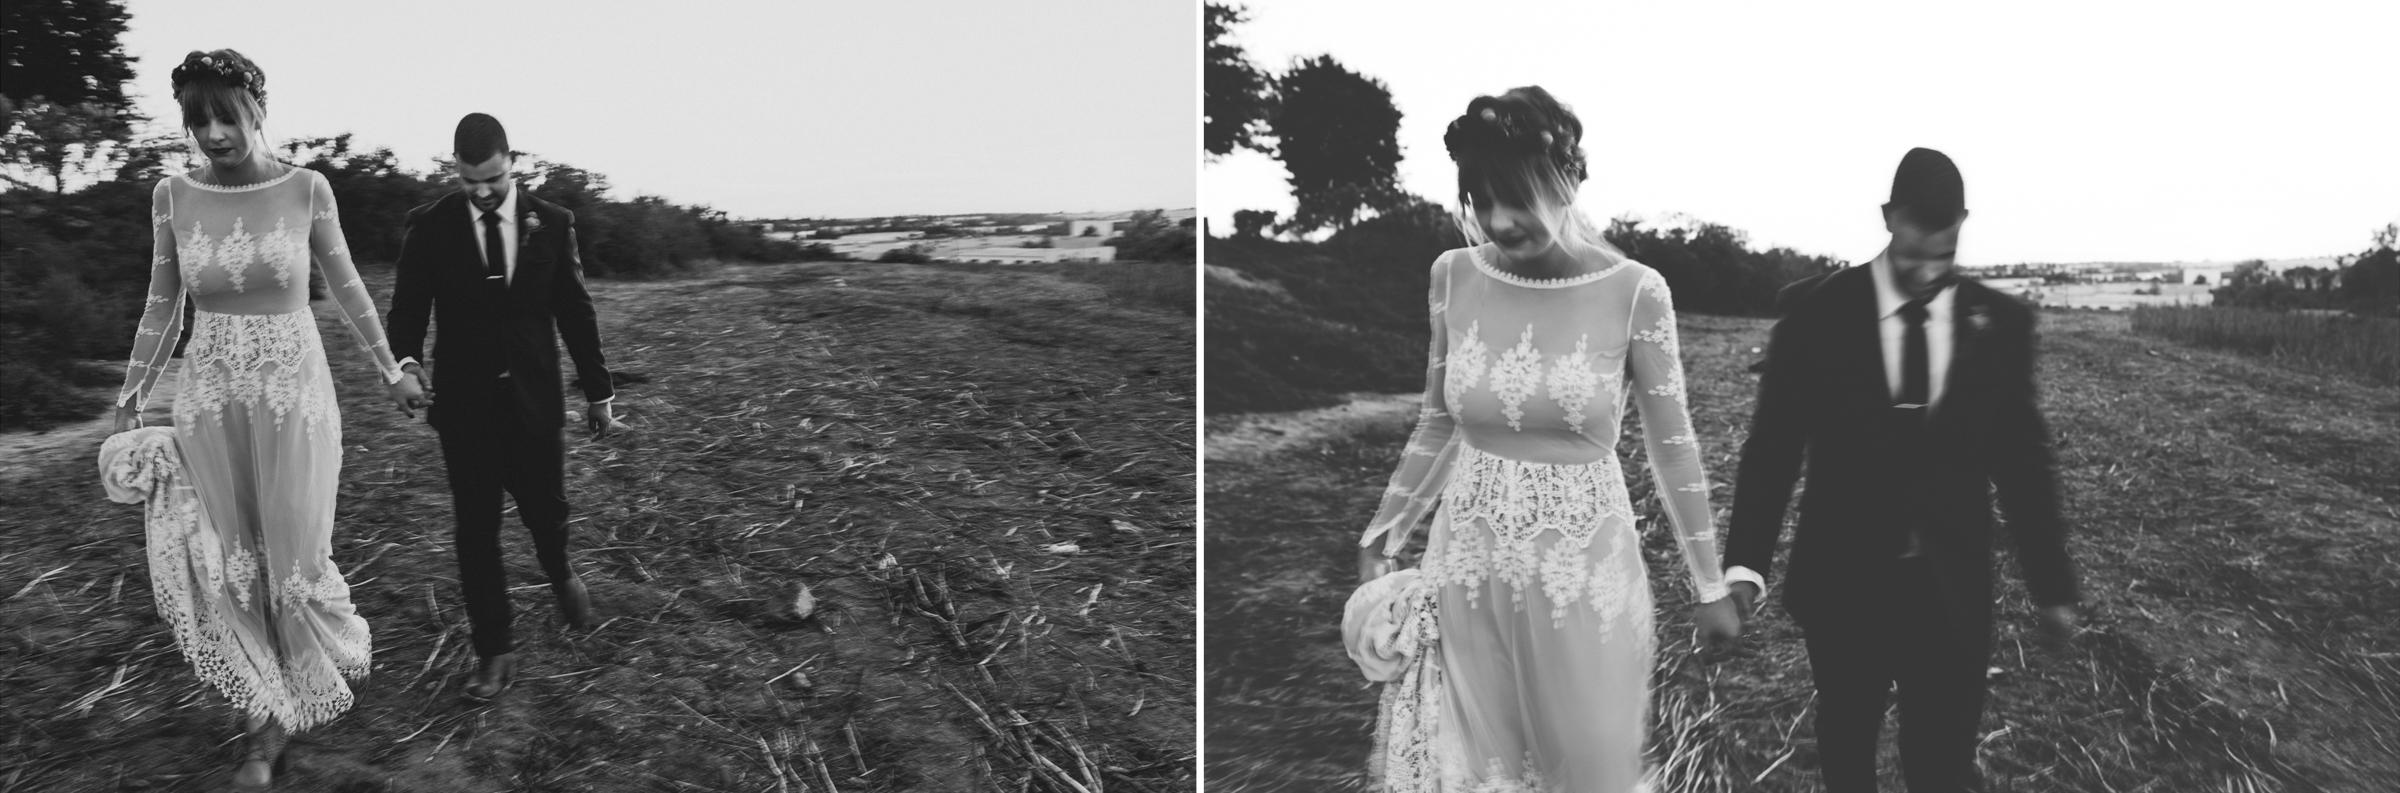 ©Isaiah + Taylor Photography - The Woodshed Booze Brothers Wedding, Vista California Wedding Photographer-121.jpg